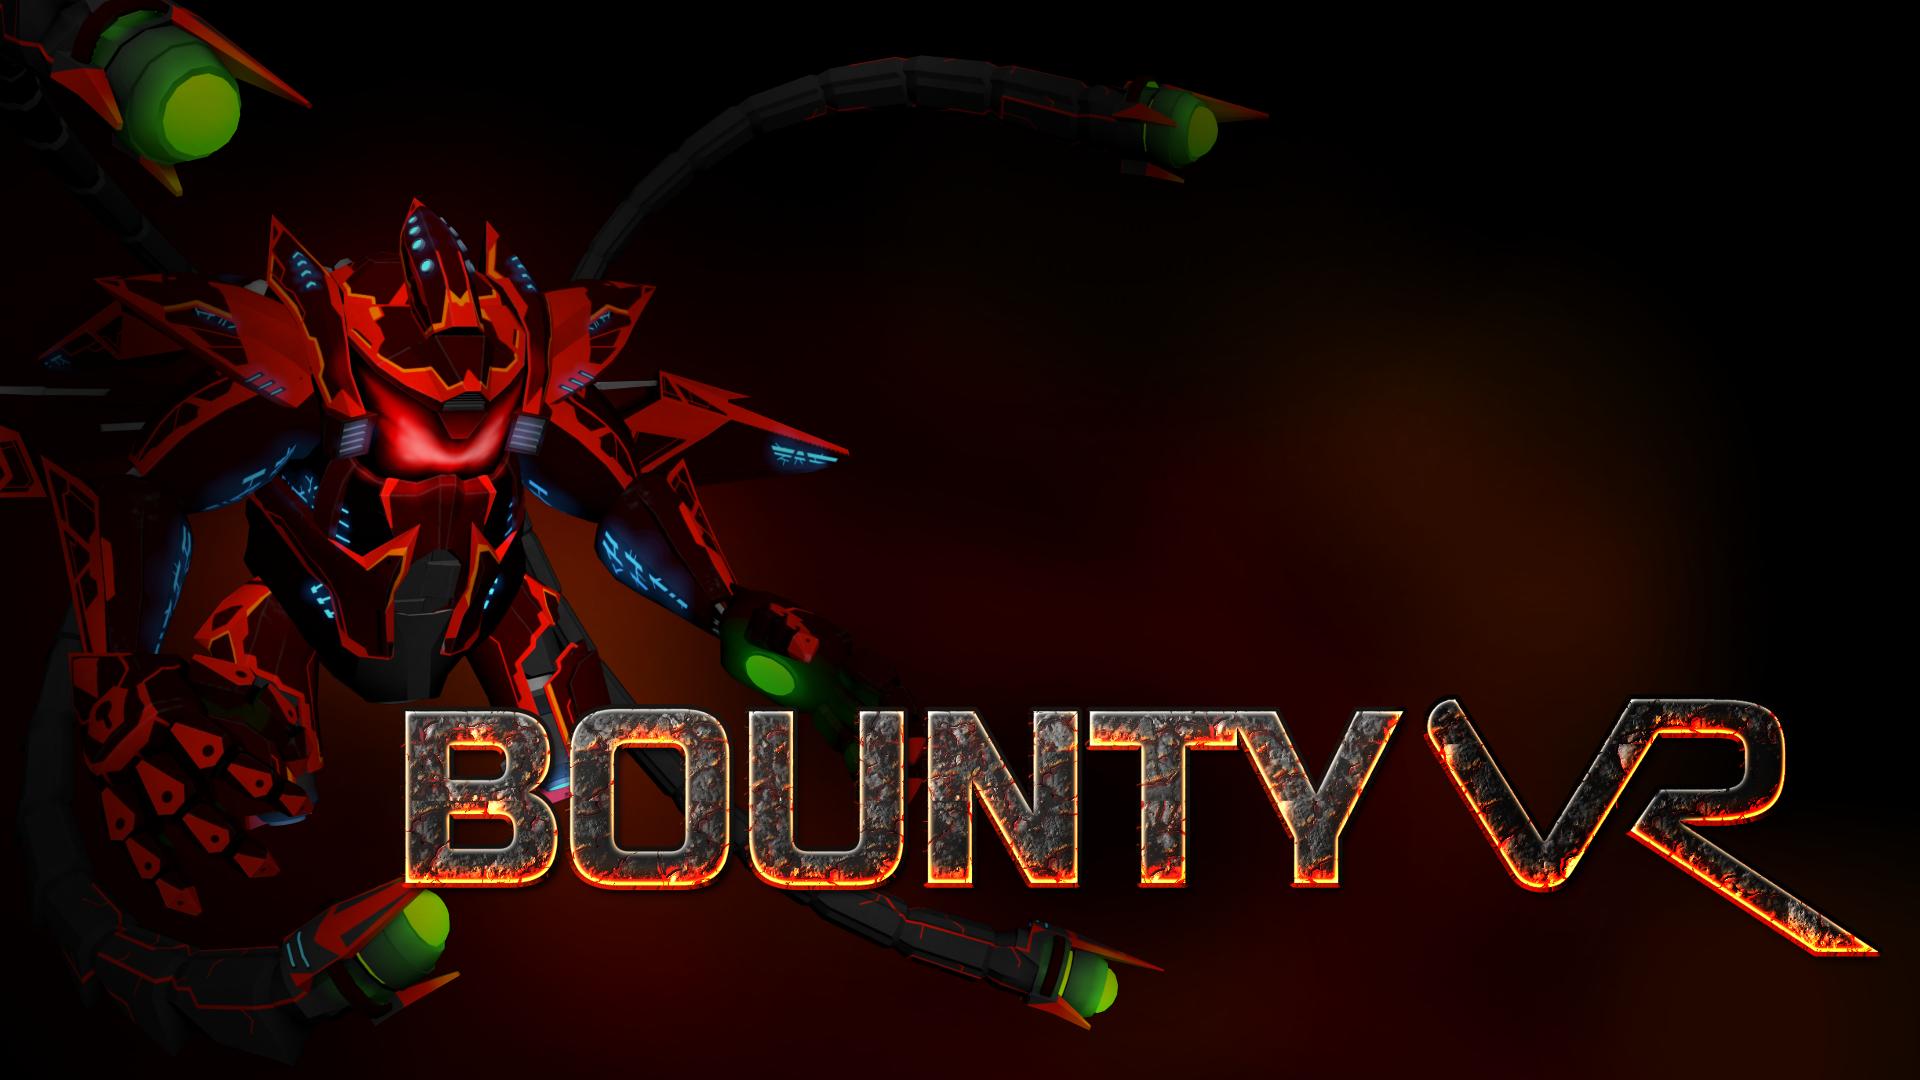 BountyVR